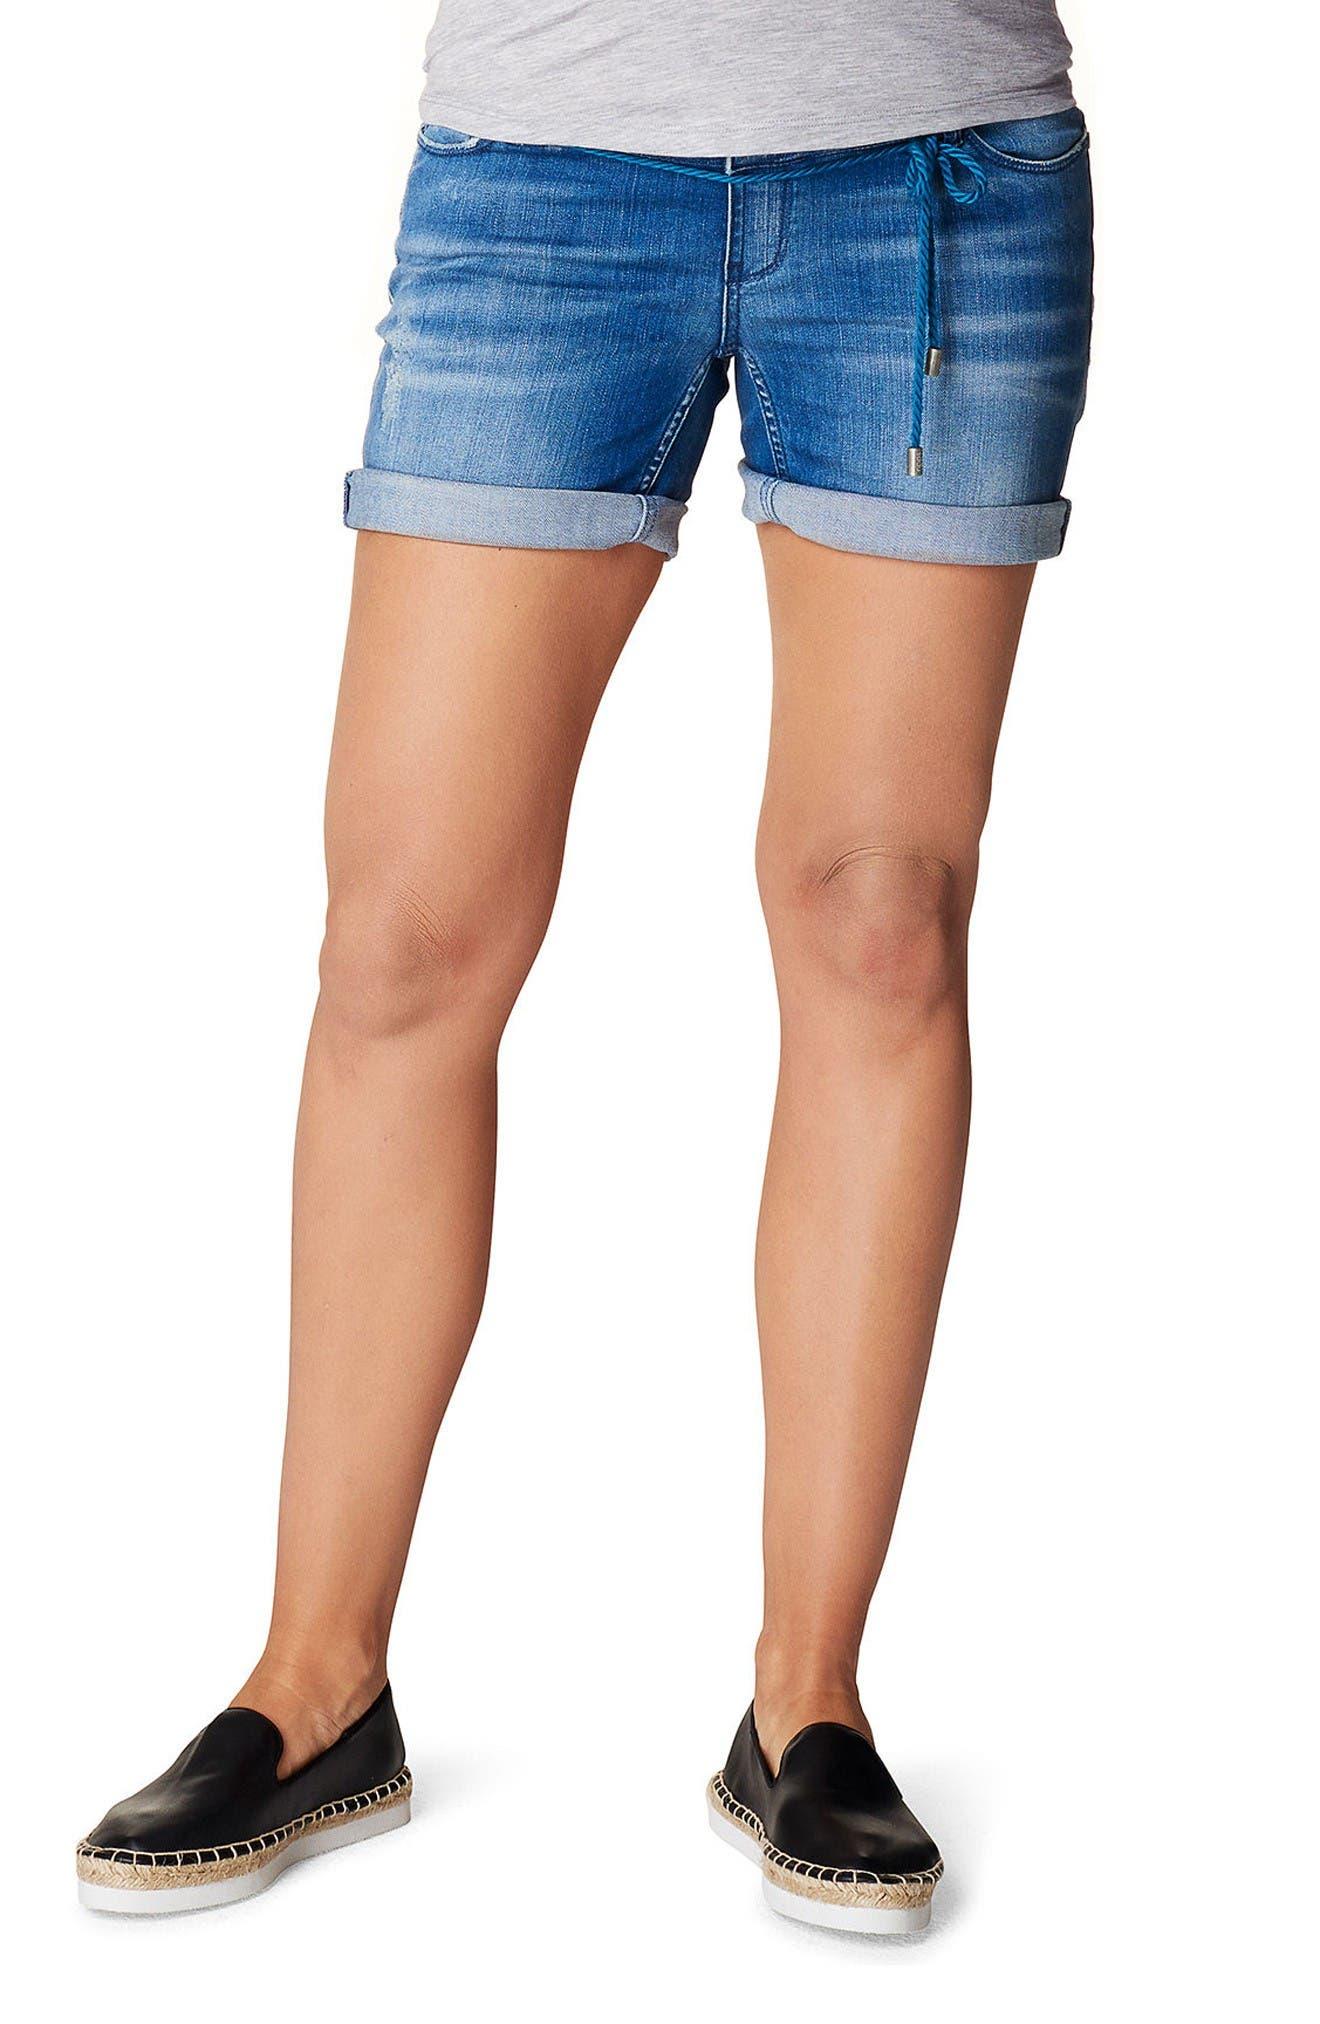 Zita Maternity Jean Shorts,                         Main,                         color, Mid Blue